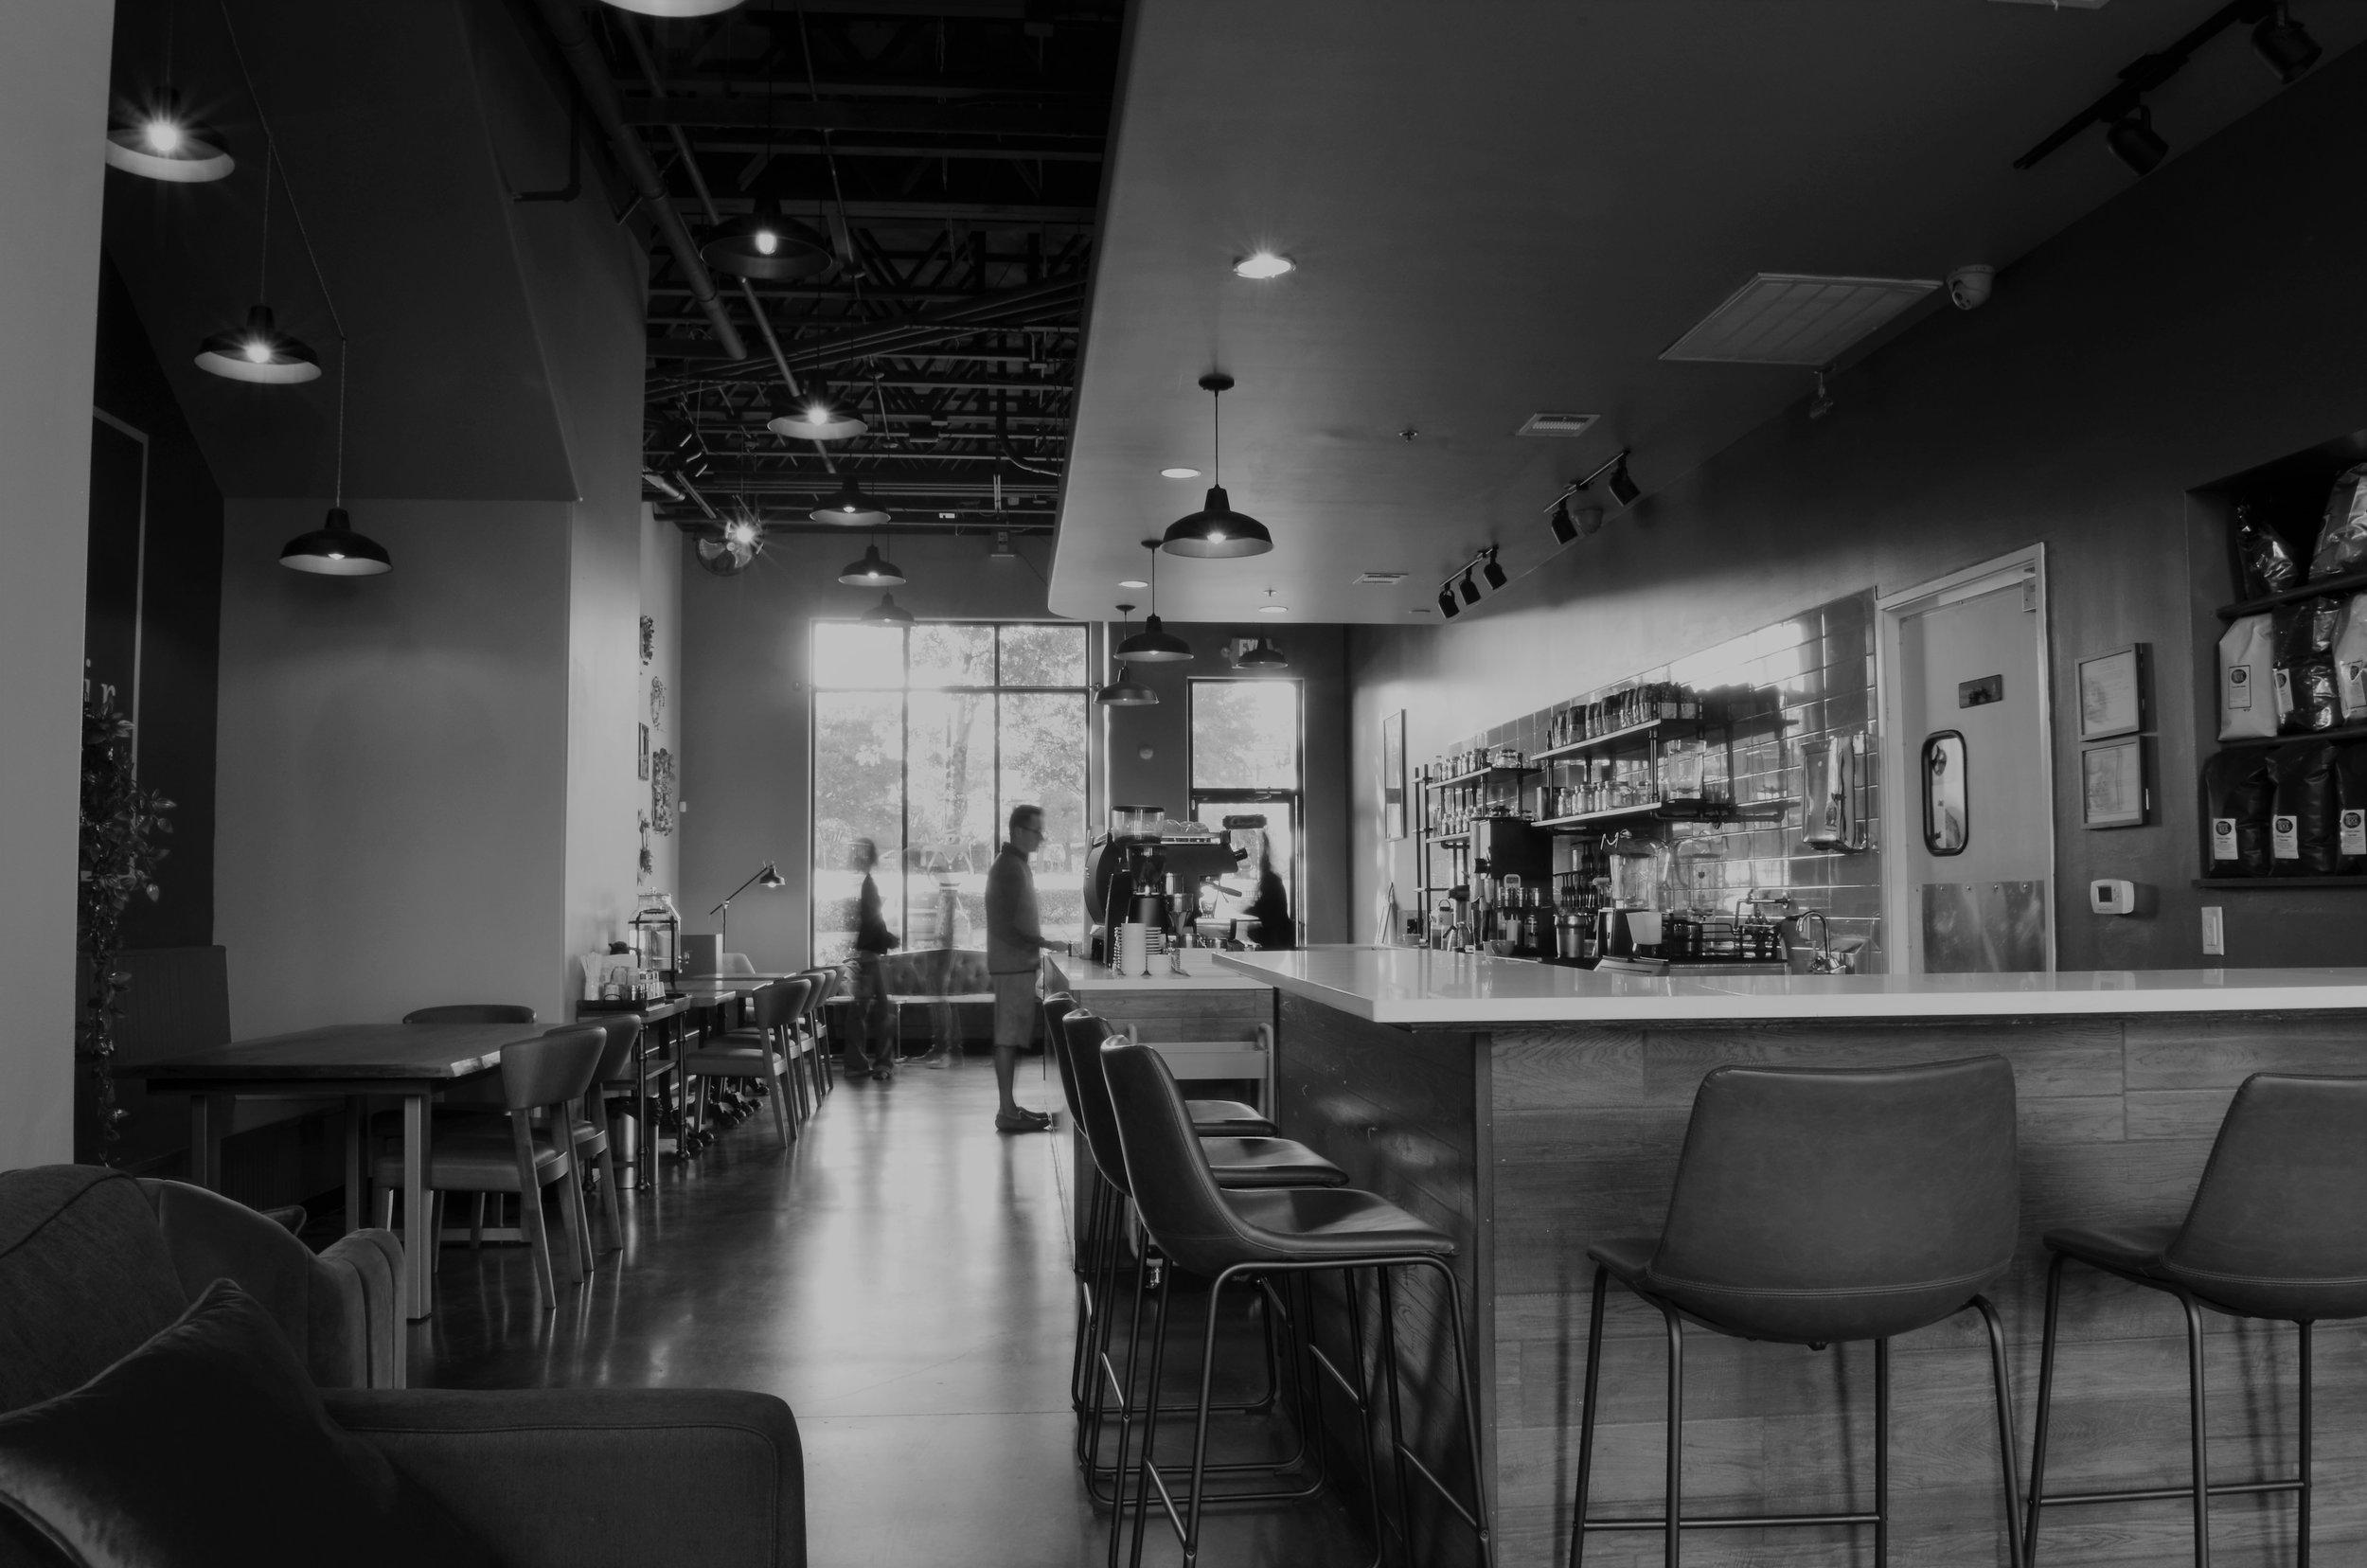 Coffee Bar BnW.JPG